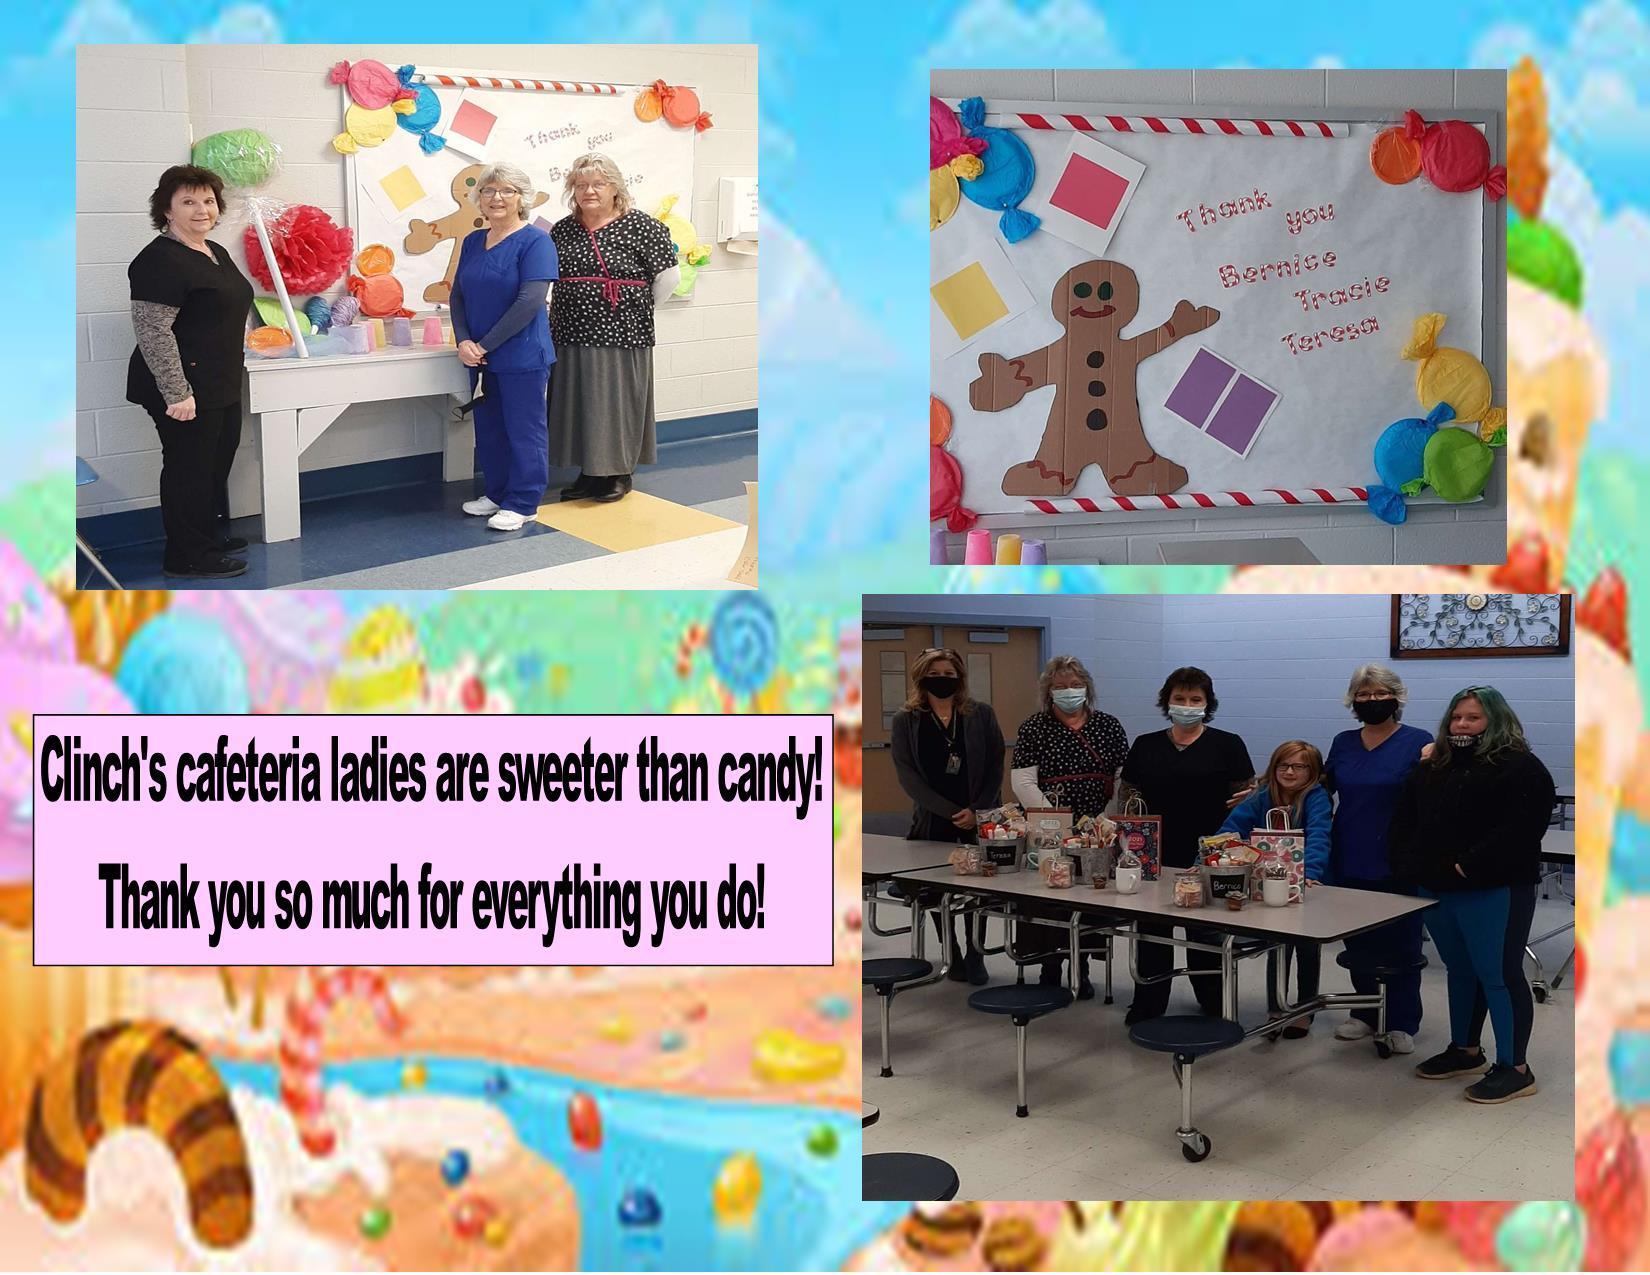 Clinch Cafeteria Staff Appreciation